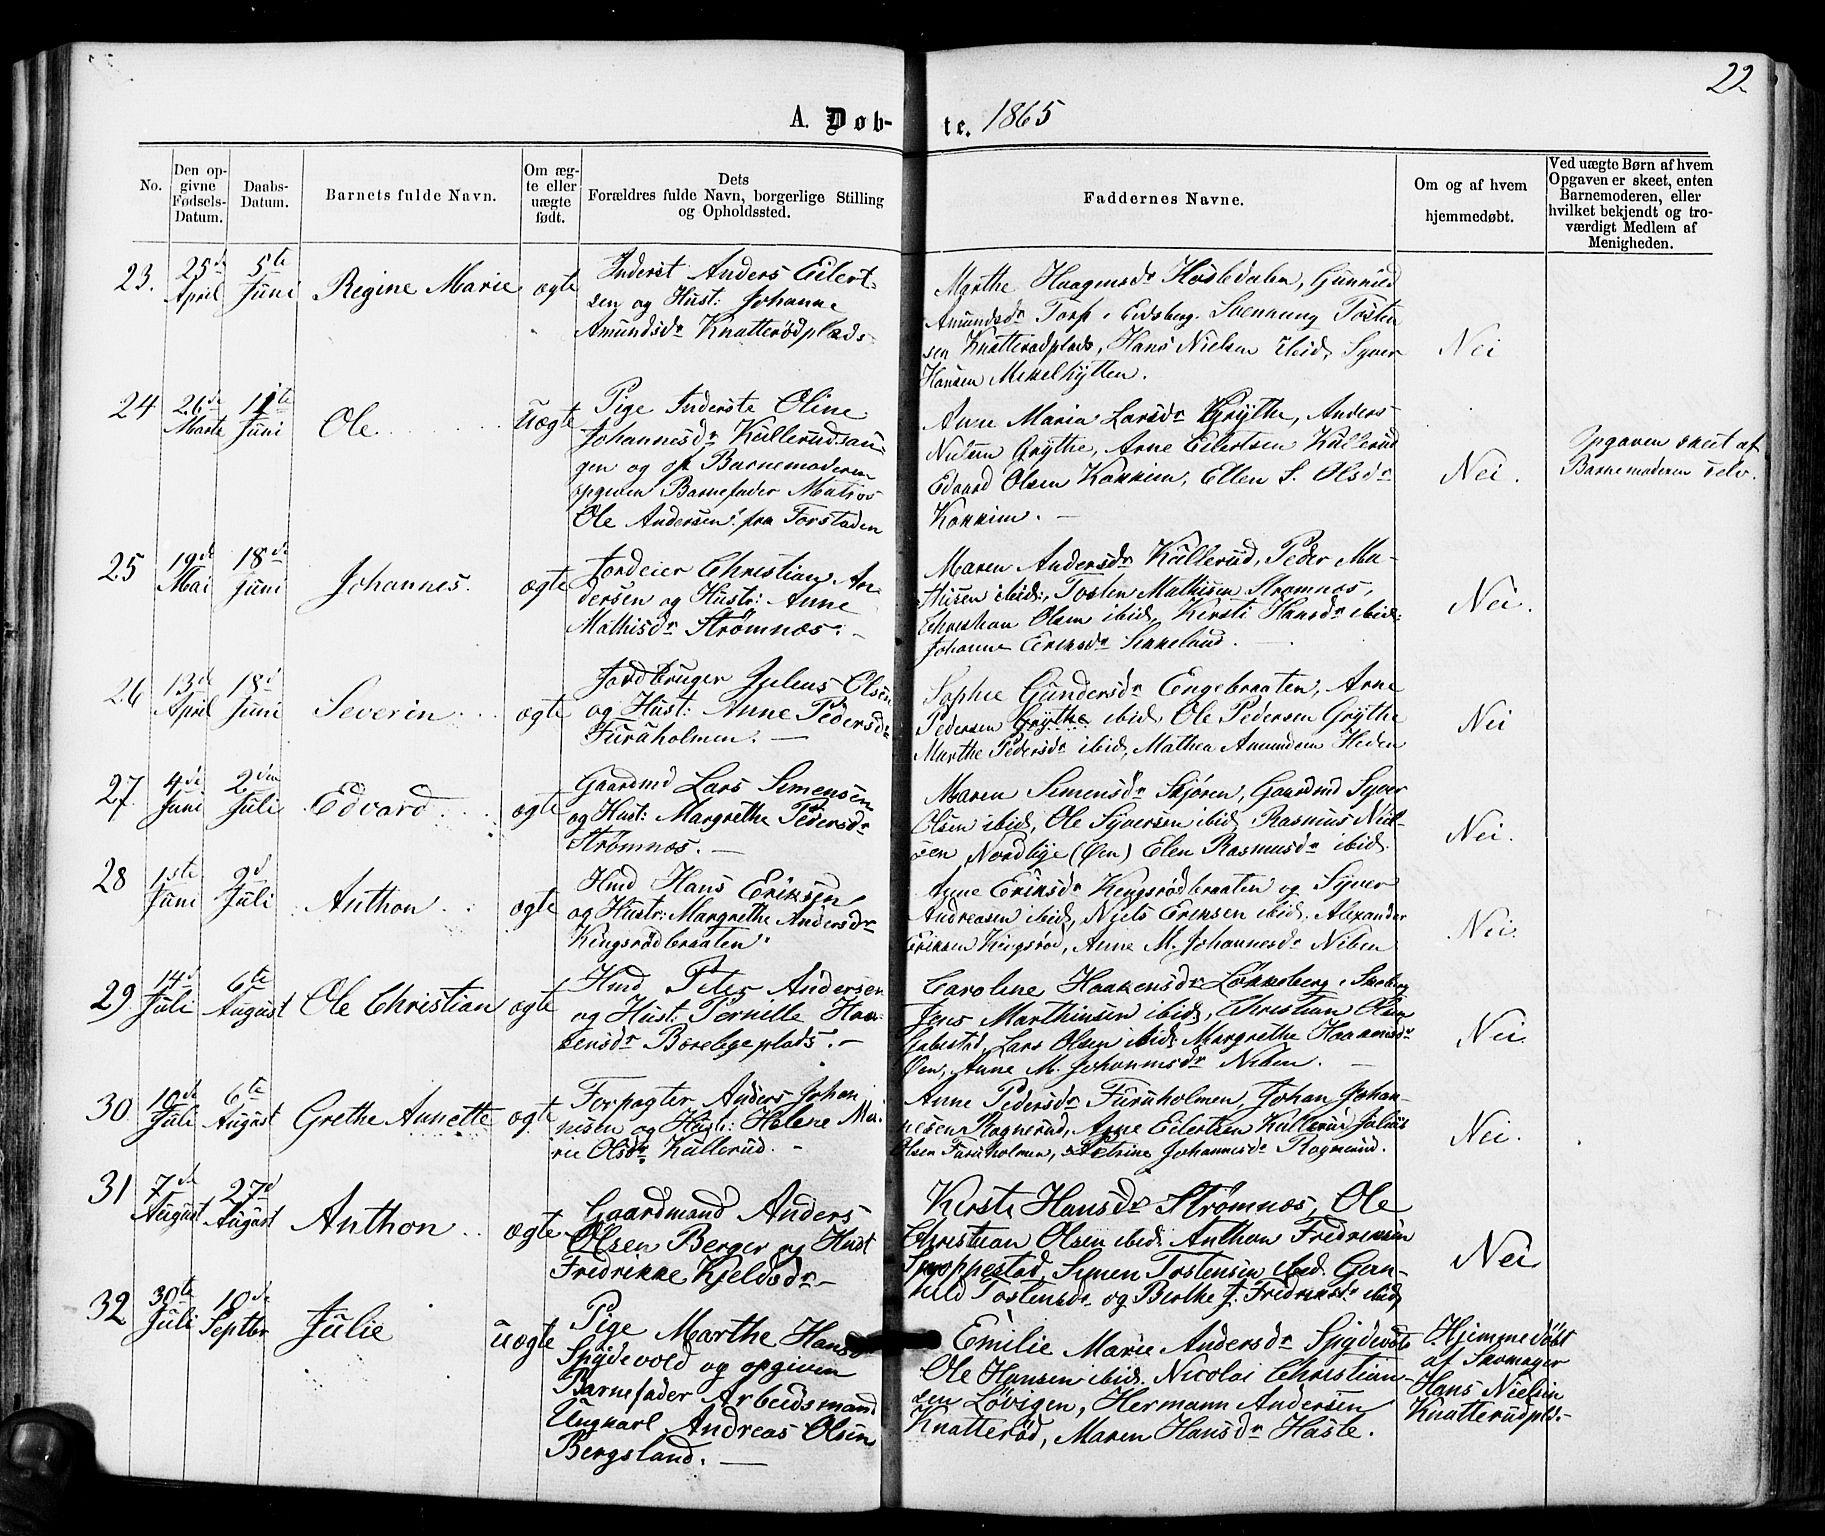 SAO, Varteig prestekontor Kirkebøker, F/Fa/L0001: Ministerialbok nr. 1, 1861-1877, s. 22